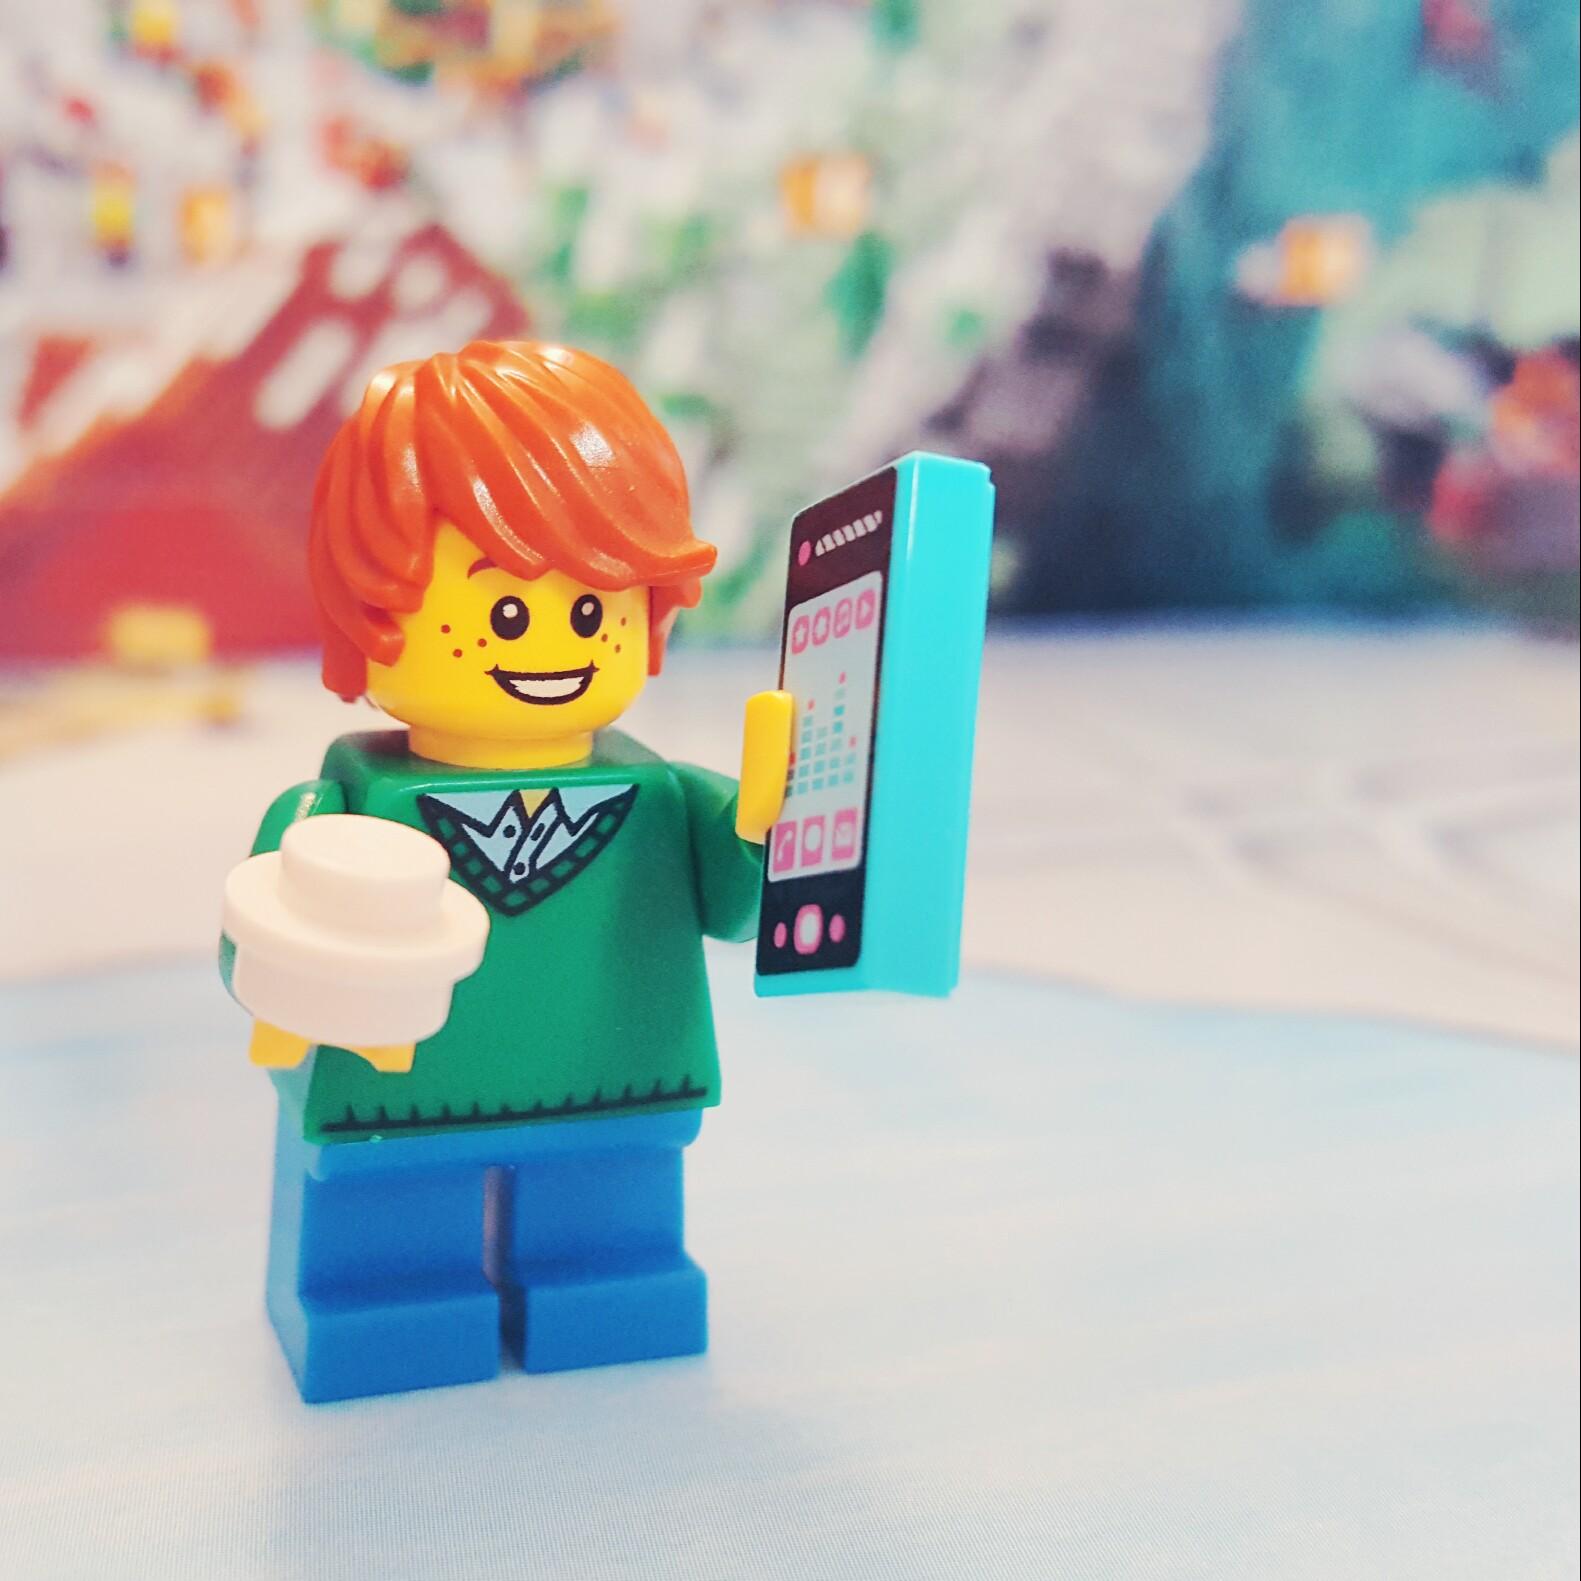 Day 7 Minifigure LEGO City Advent Calendar